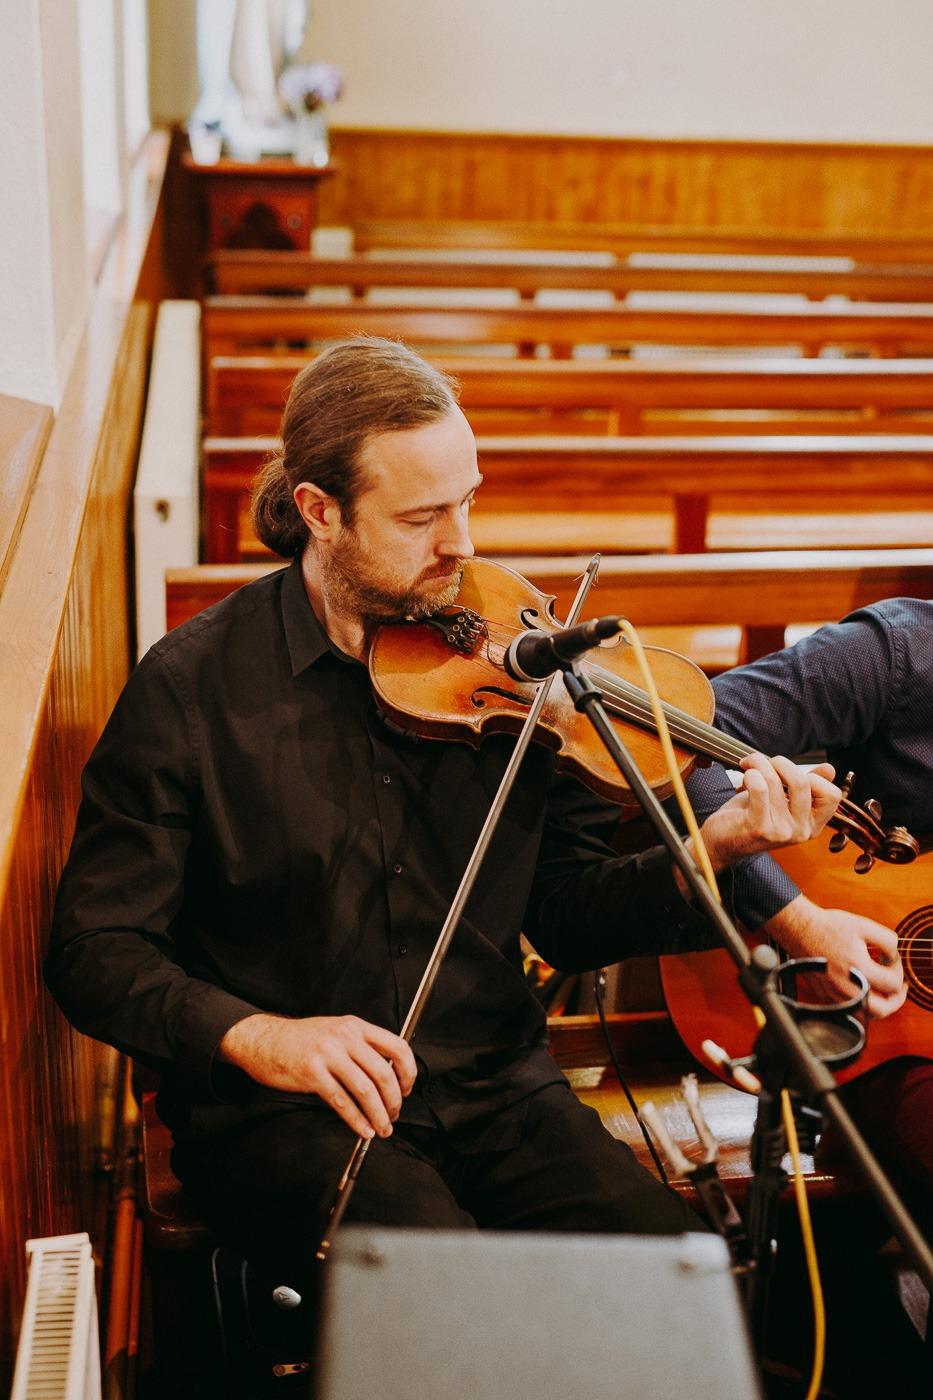 A man holding a violin